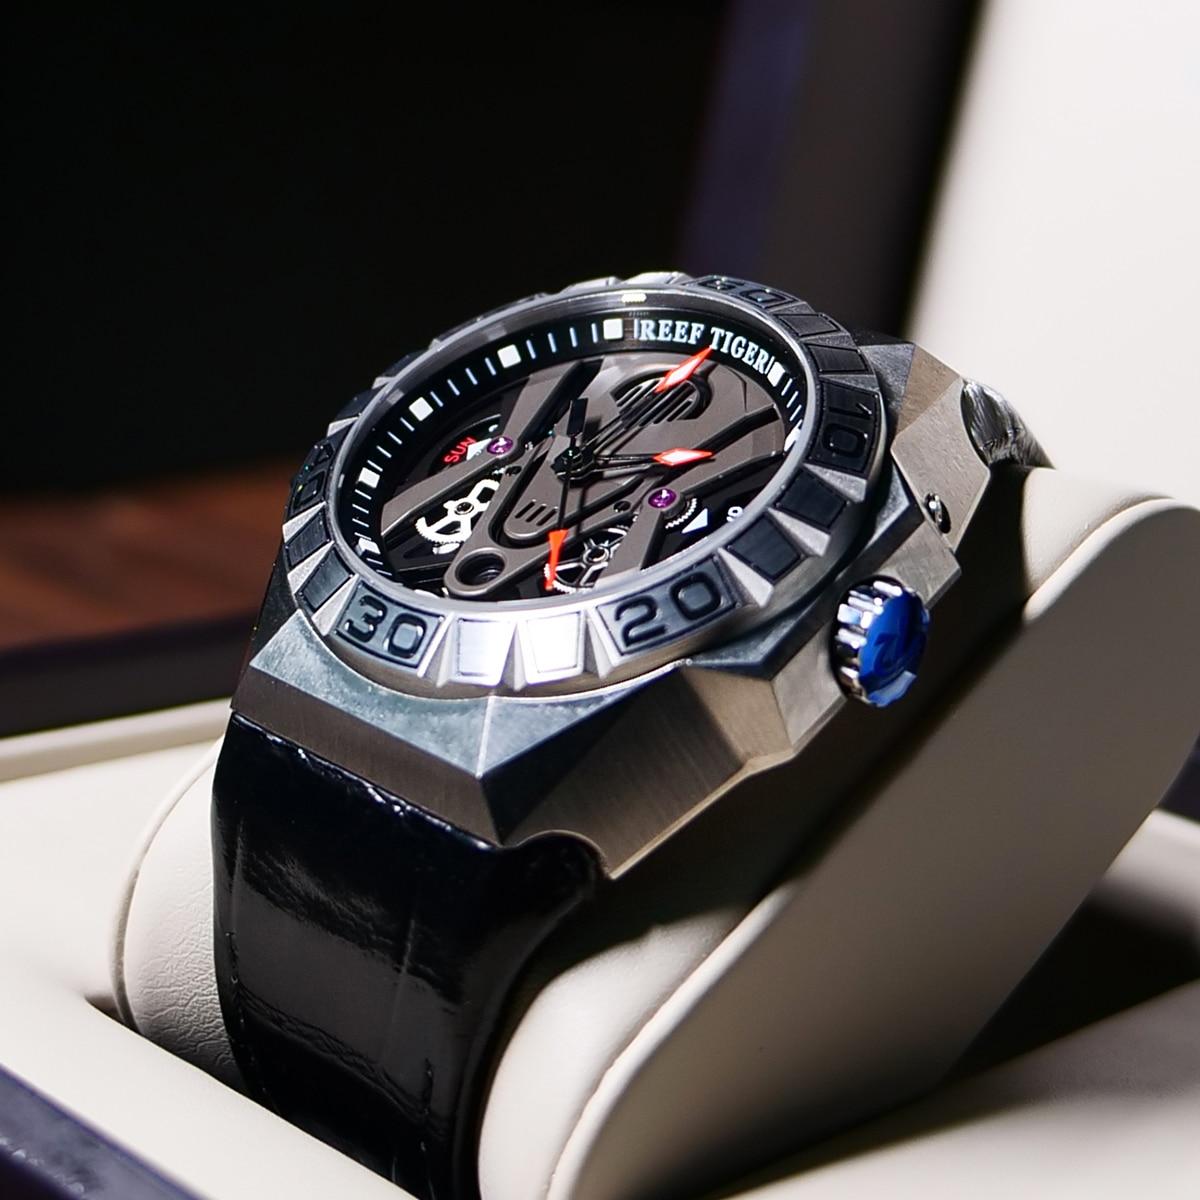 Reef Tiger/RT Top Brand Men Sport Watches Automatic Skeleton Watch Steel Waterproof Leather Strap Relogio Masculino RGA6912 6